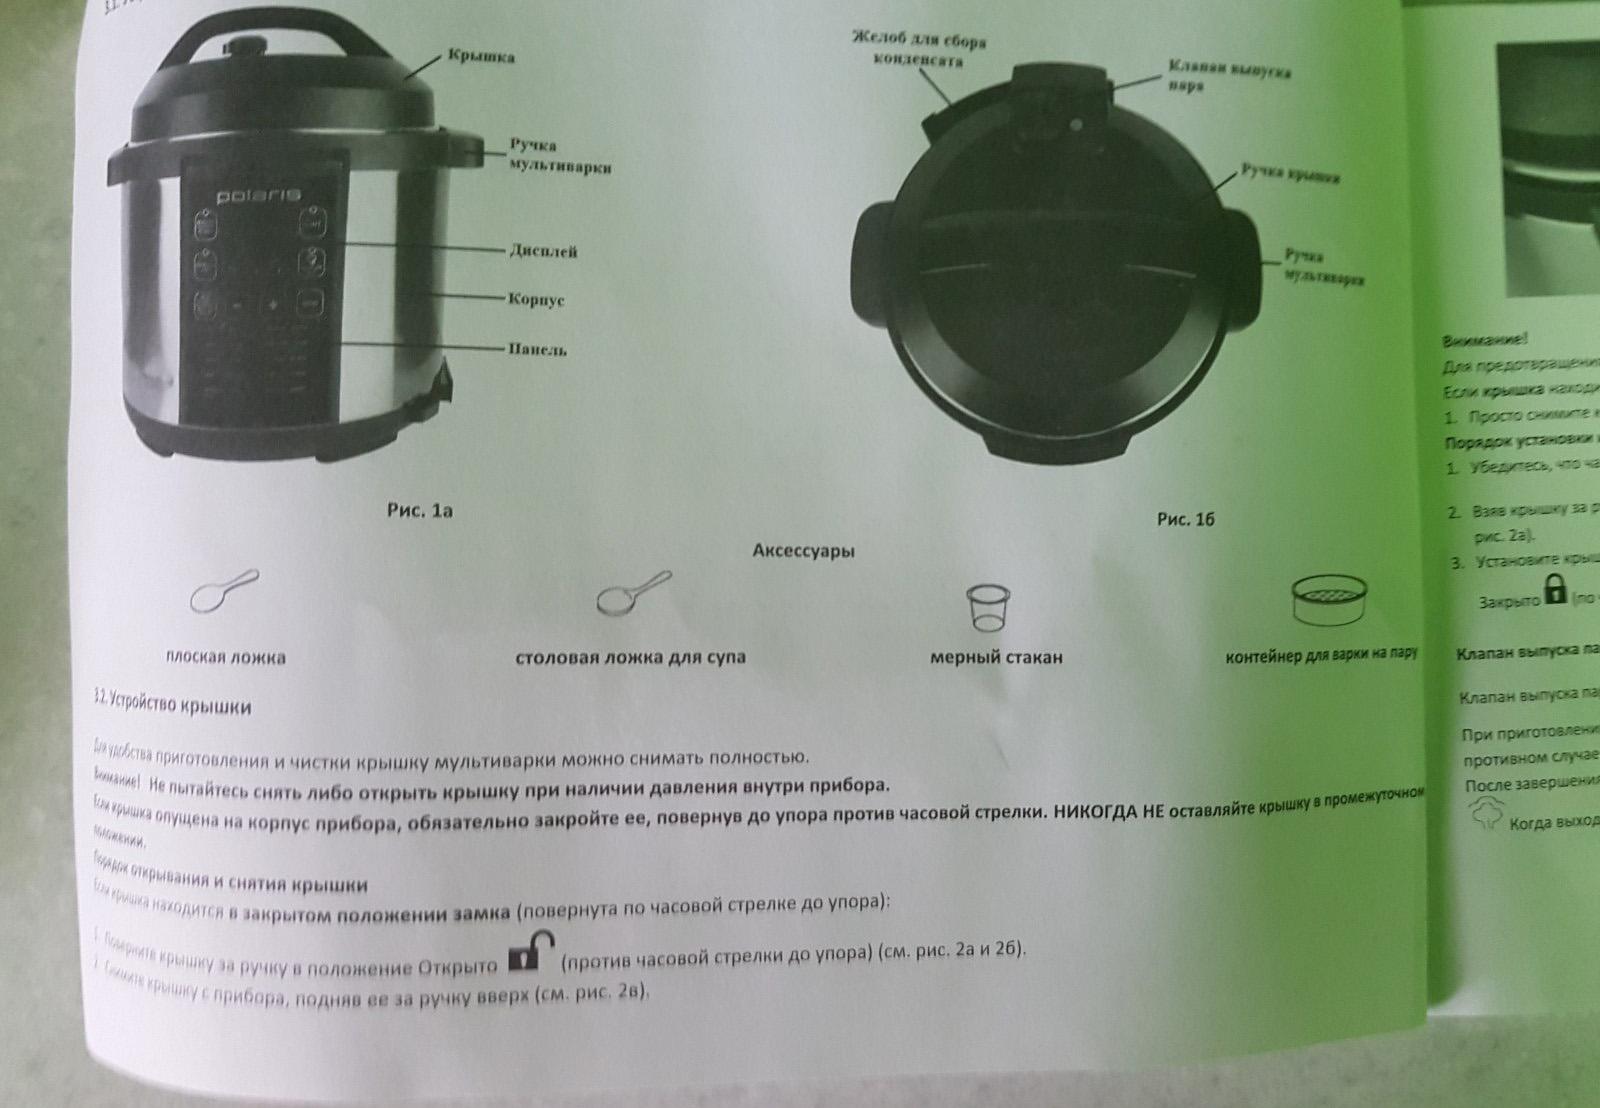 Инструкция мультиварки-скороварки